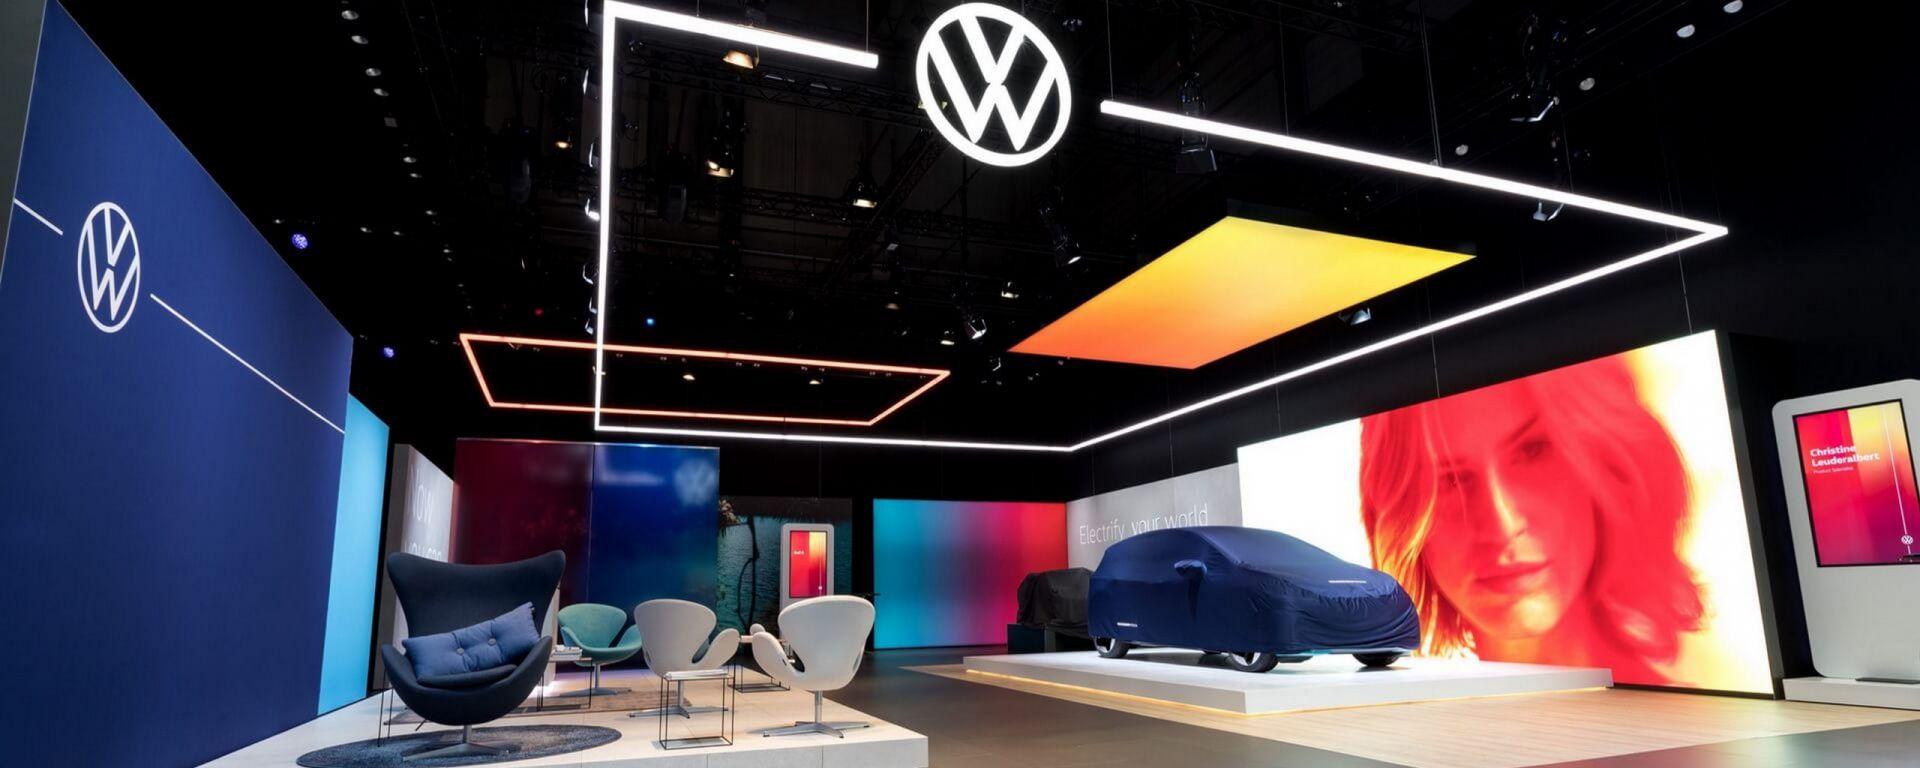 Volkswagen rinuncia a Parigi 2020